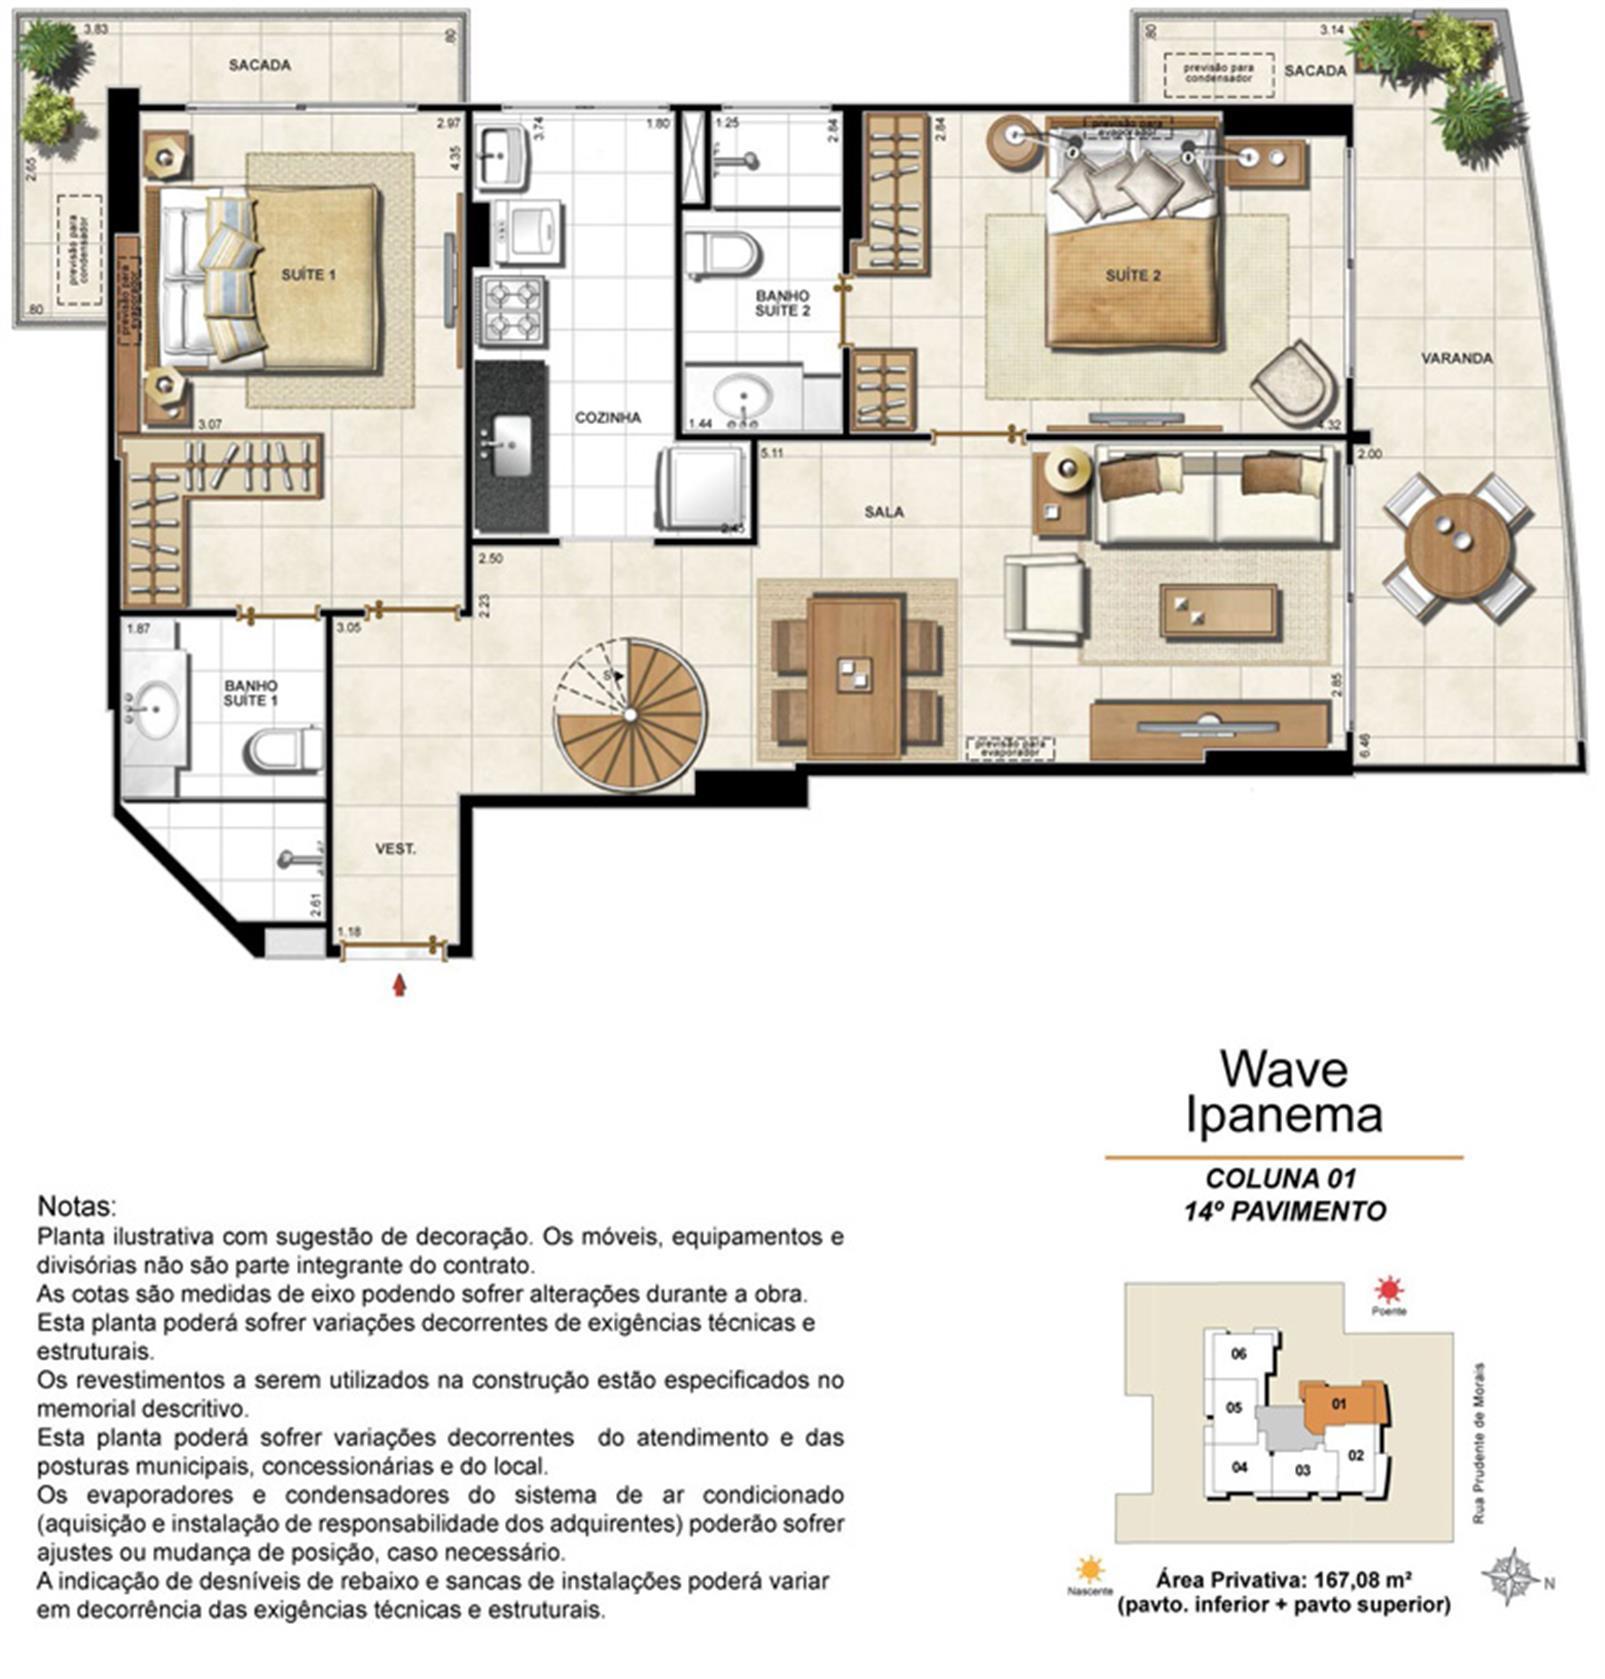 Apartamento Cobertura 1401 | Wave Ipanema – Apartamentoem  Ipanema - Rio de Janeiro - Rio de Janeiro